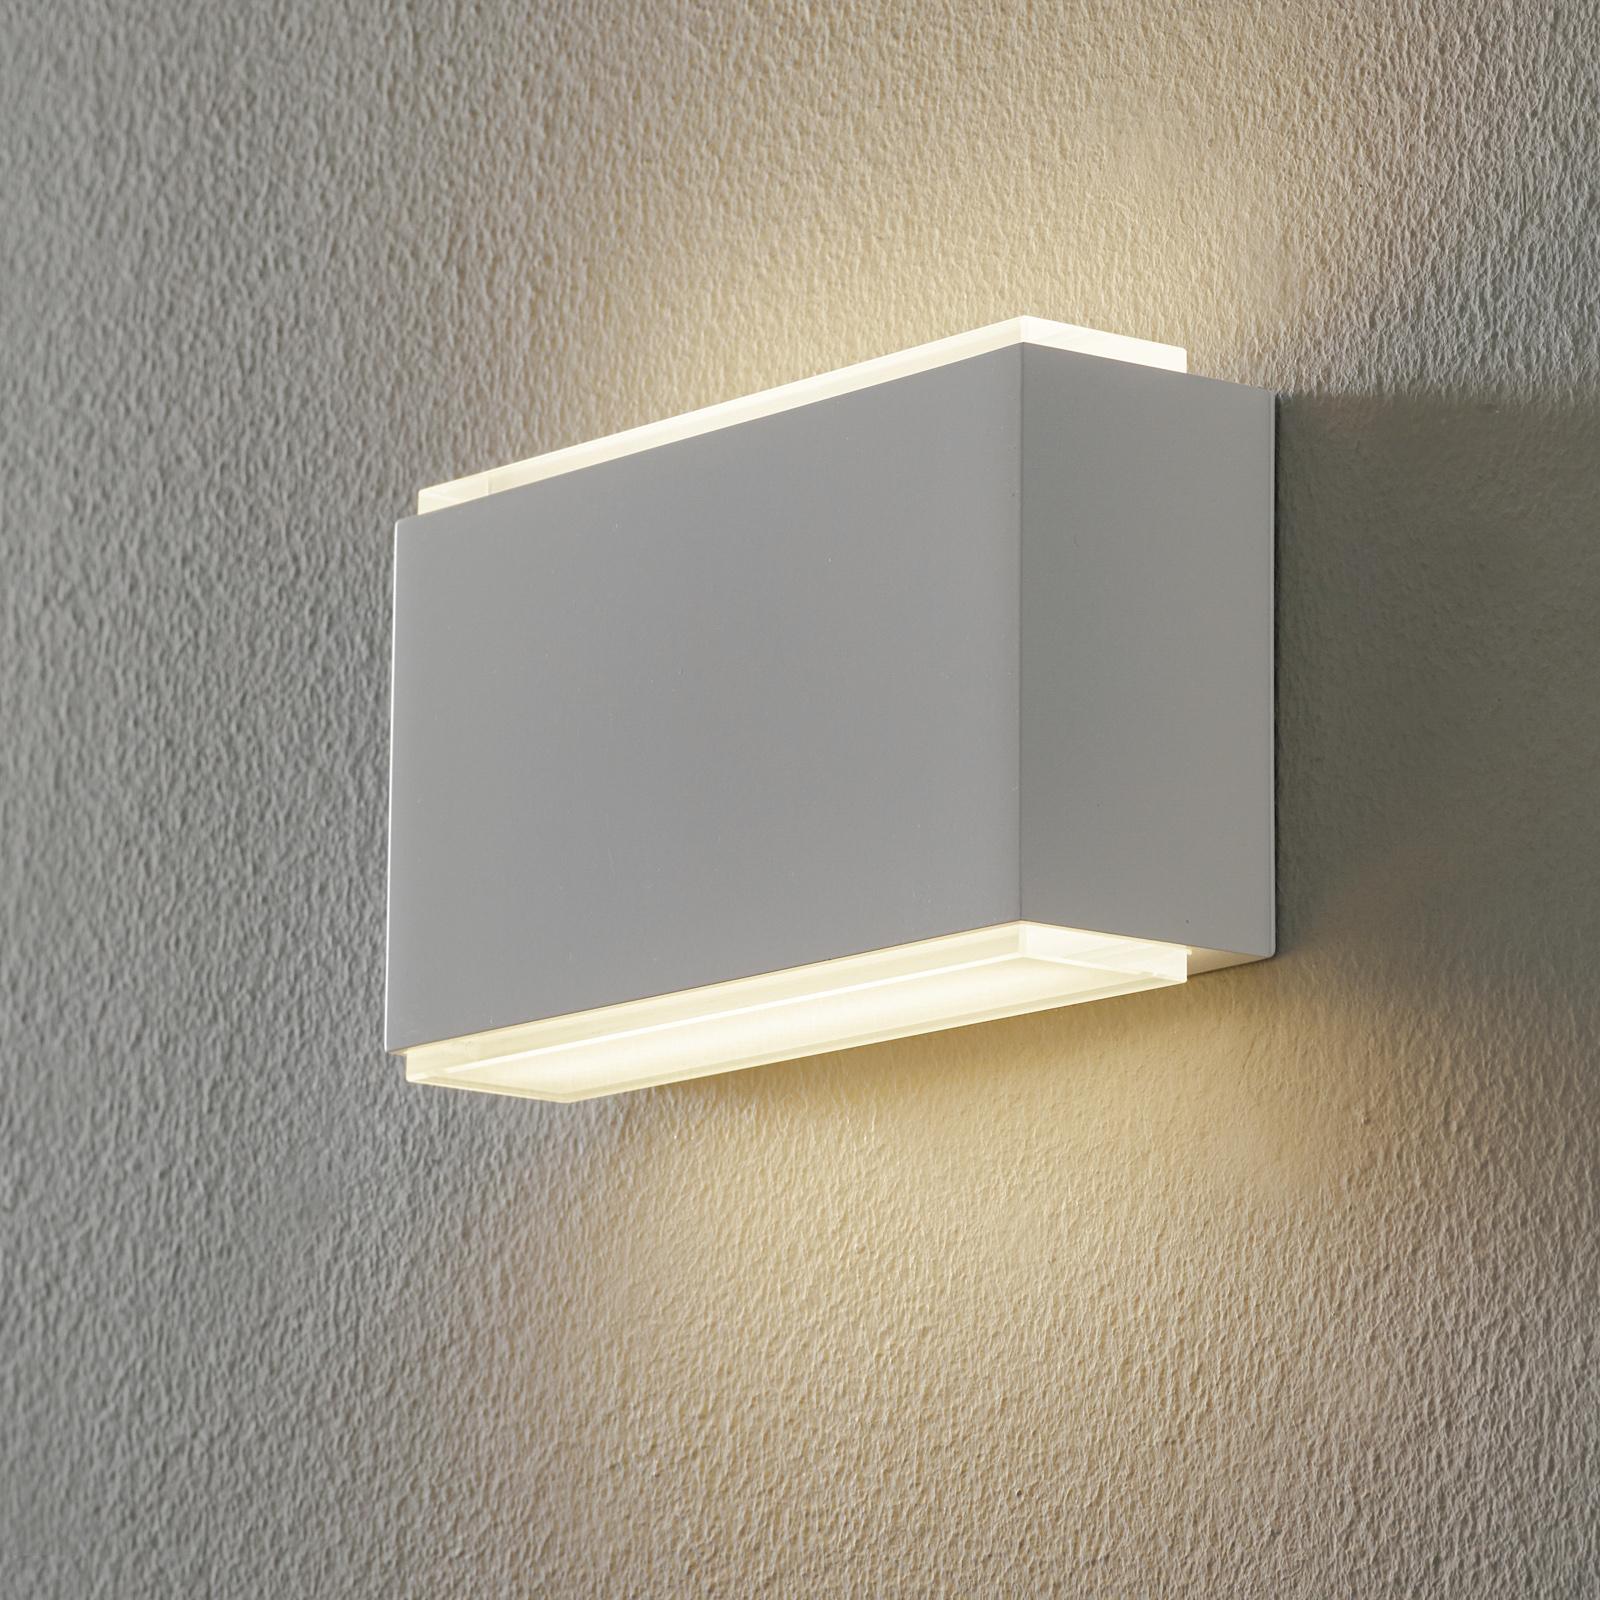 BEGA 23015 LED-Wandleuchte 3000K 18cm weiß 1.260lm